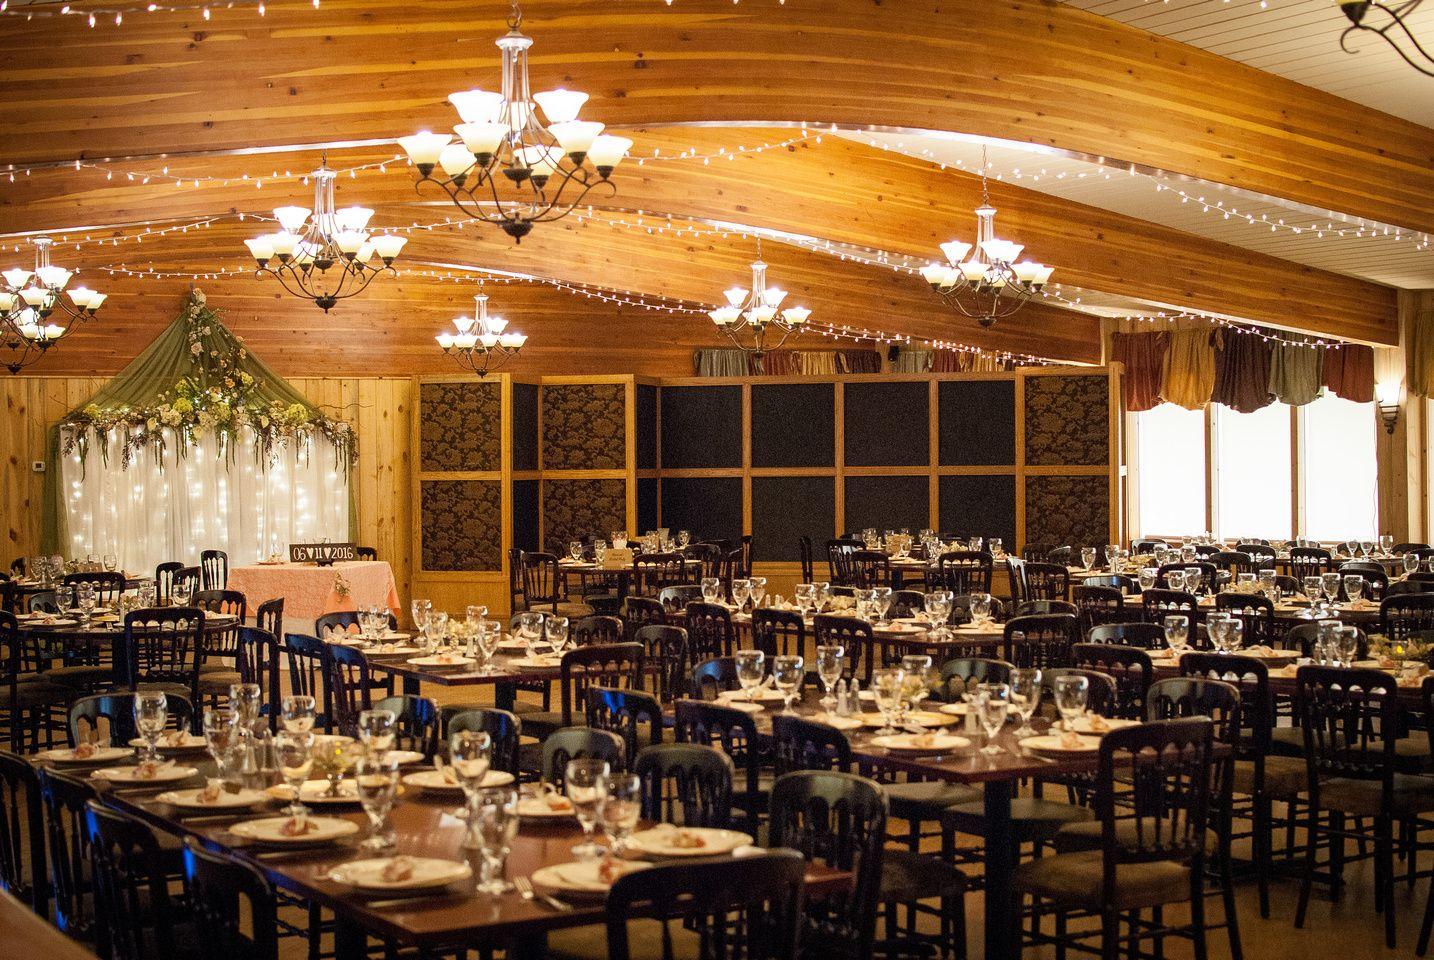 Wedding venue in Cody, Wyoming. wyomingweddings